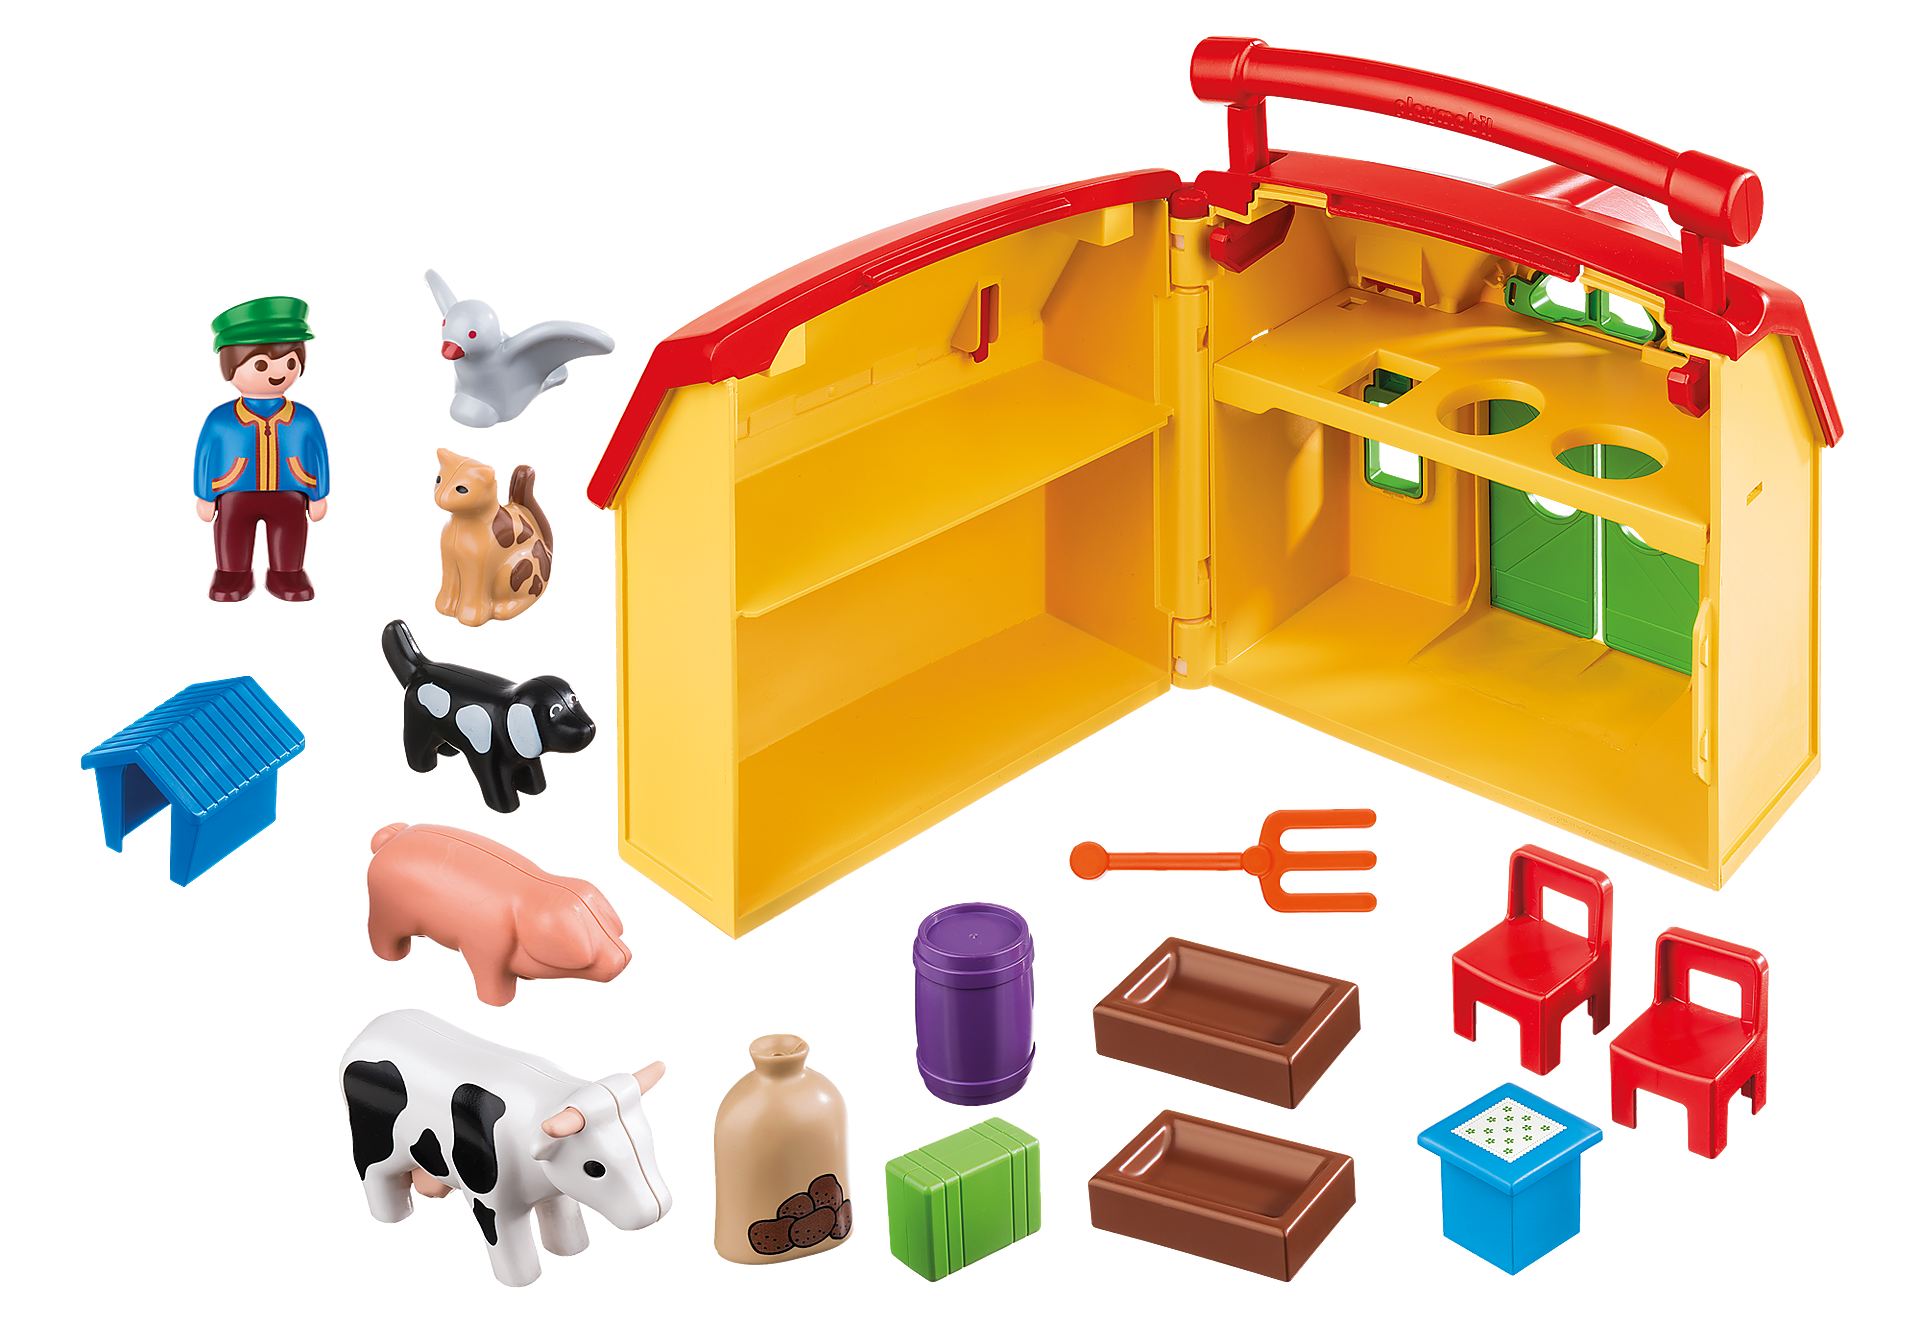 6962 Ferme transportable avec animaux  zoom image4